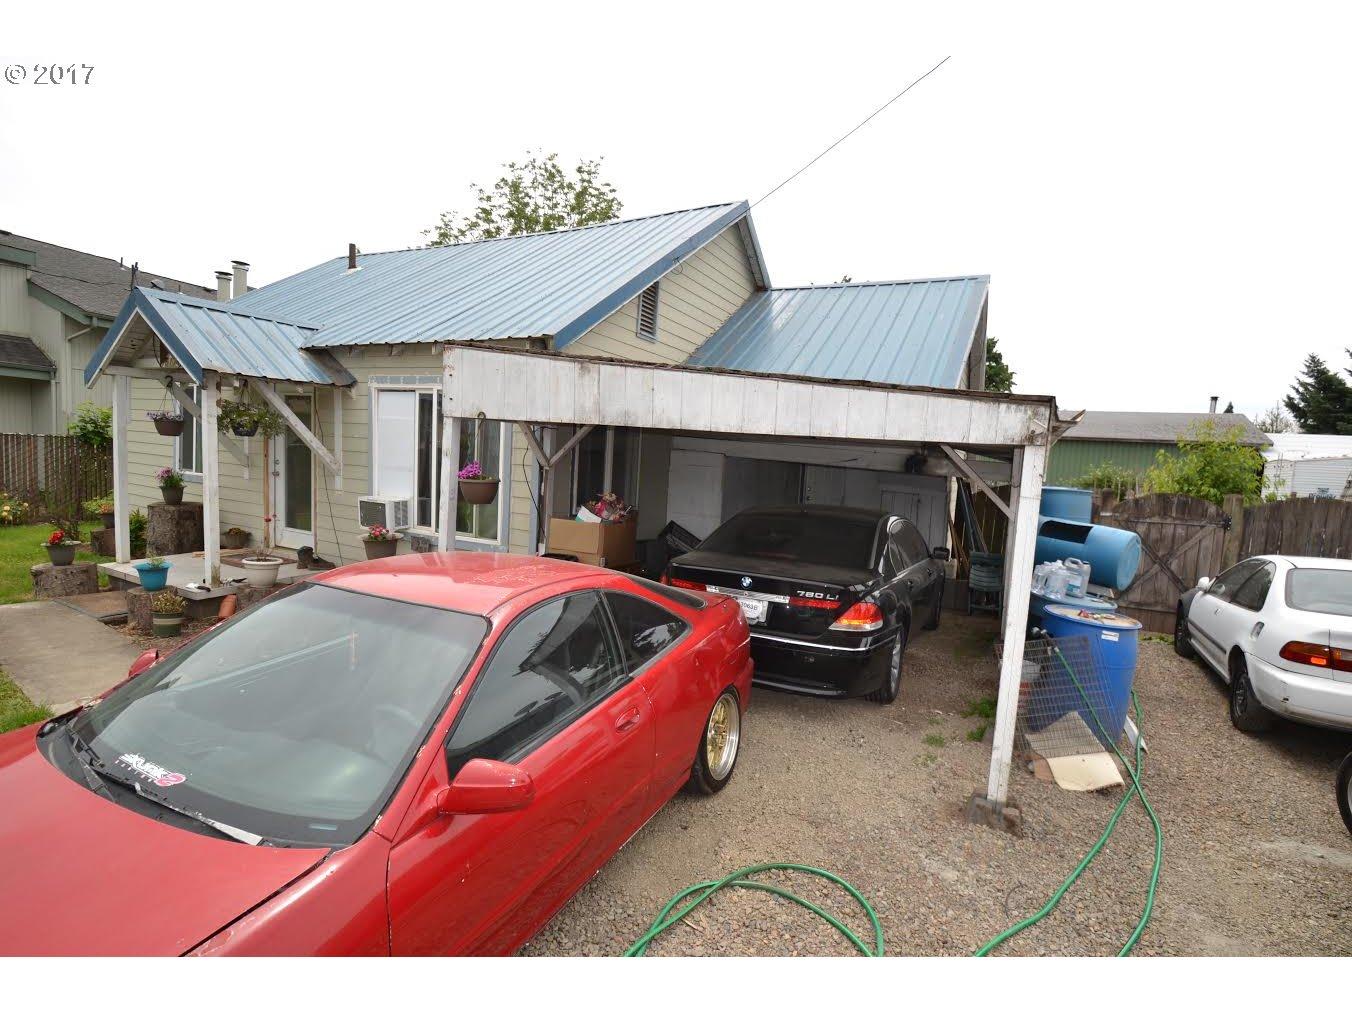 517 MORGAN AVE Salem, OR 97301 - MLS #: 17644436